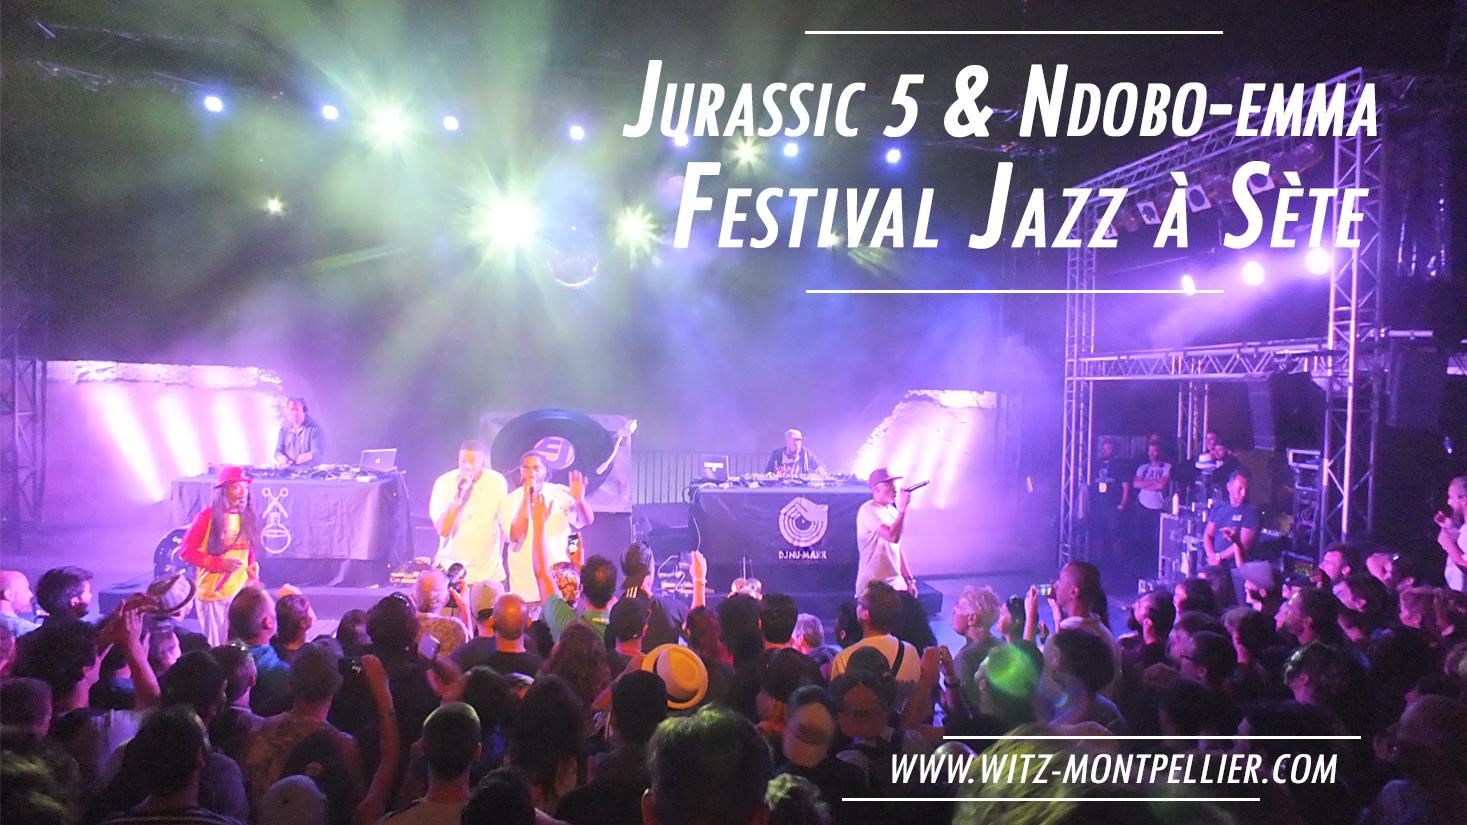 Jurassic 5 et Ndobo-emma au Festival Jazz à Sète